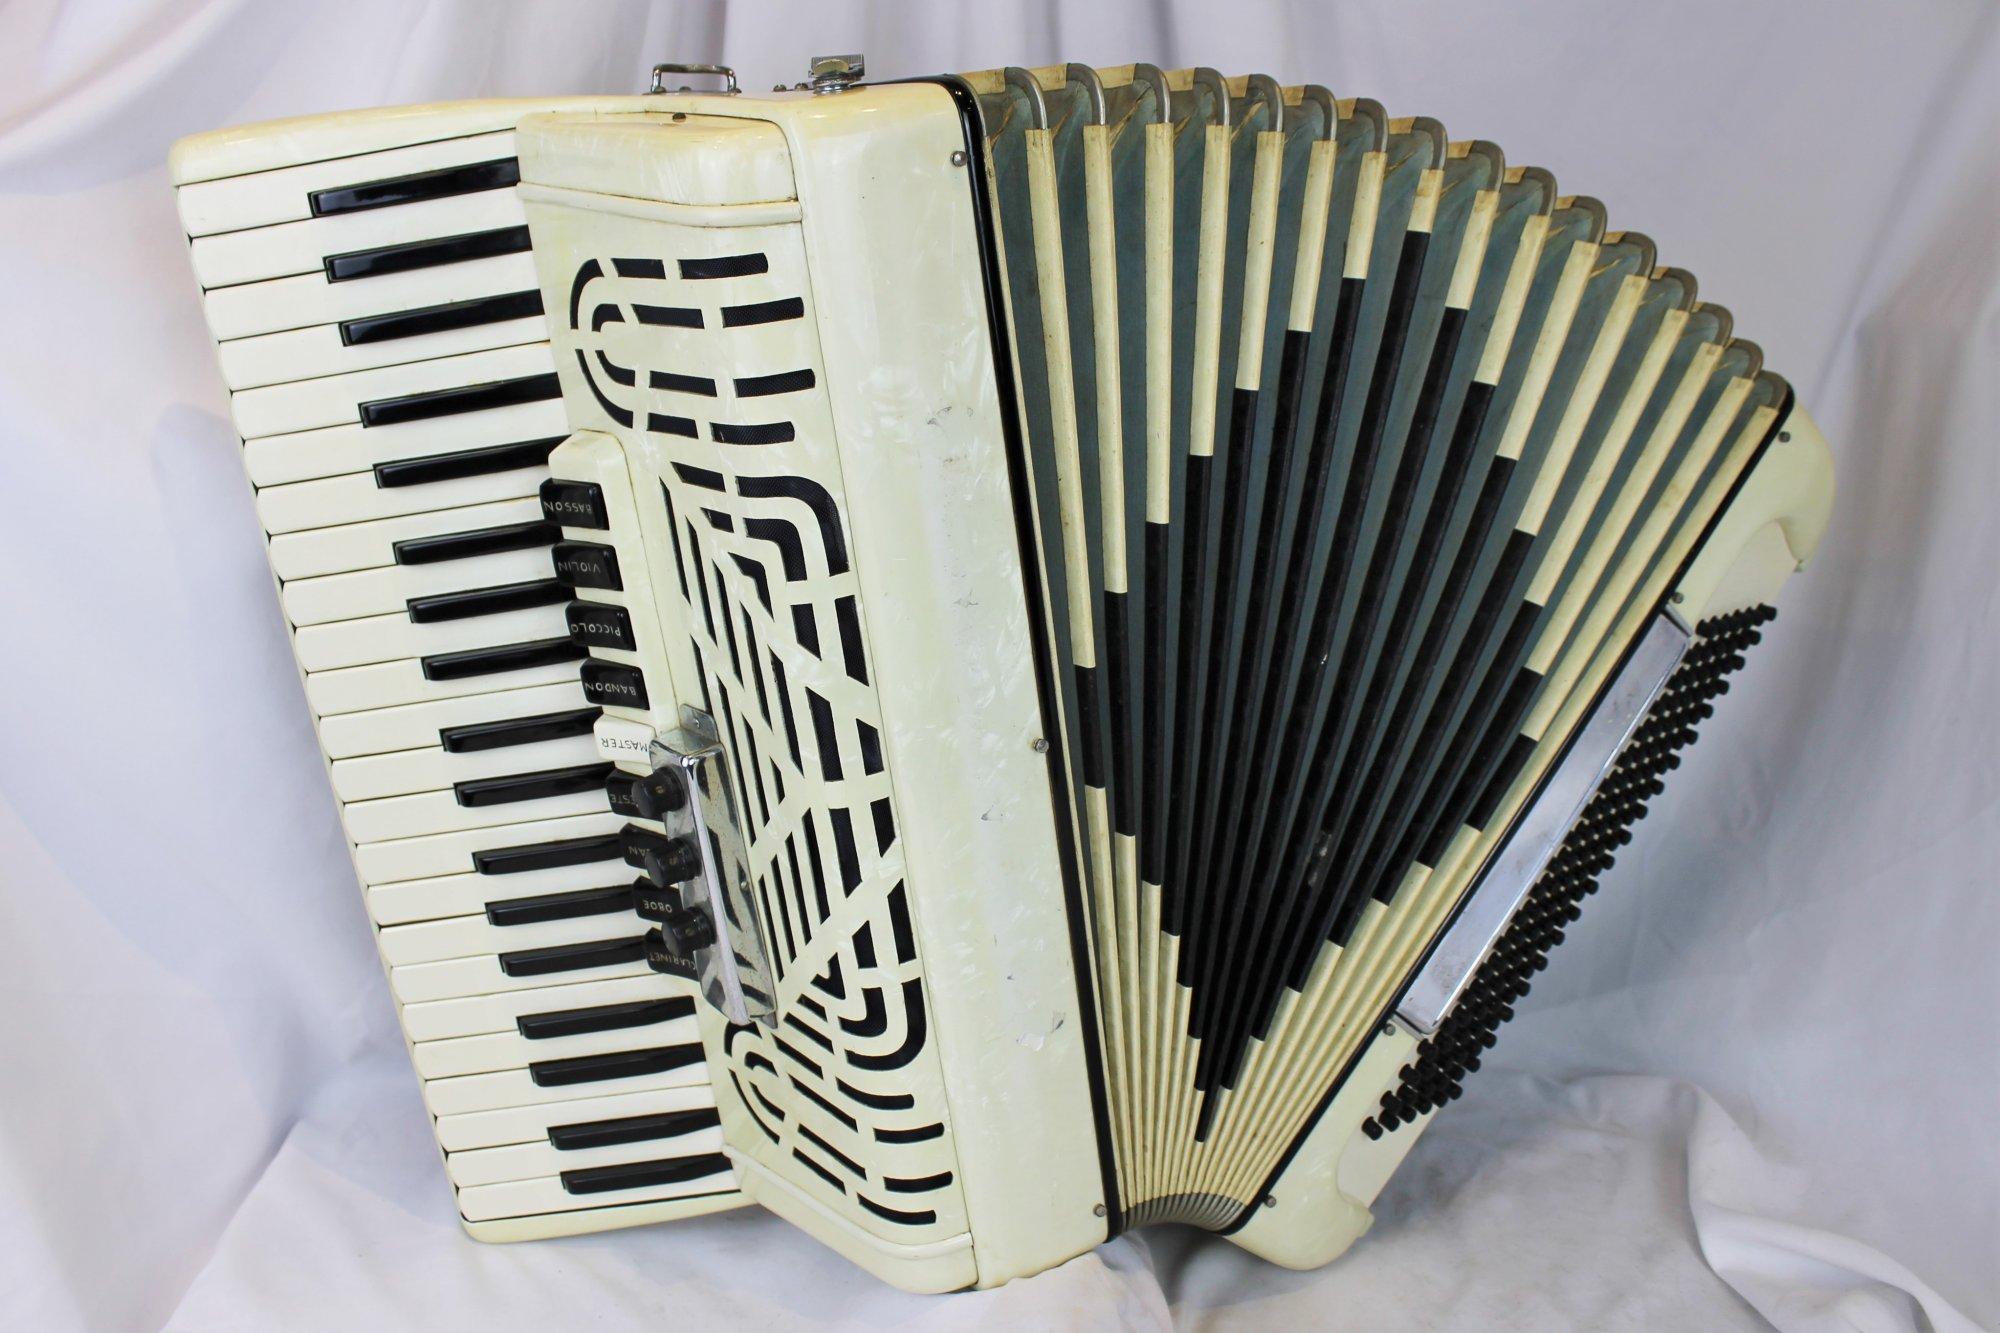 4391 - Vanilla Noble Piano Accordion LMMH 41 120